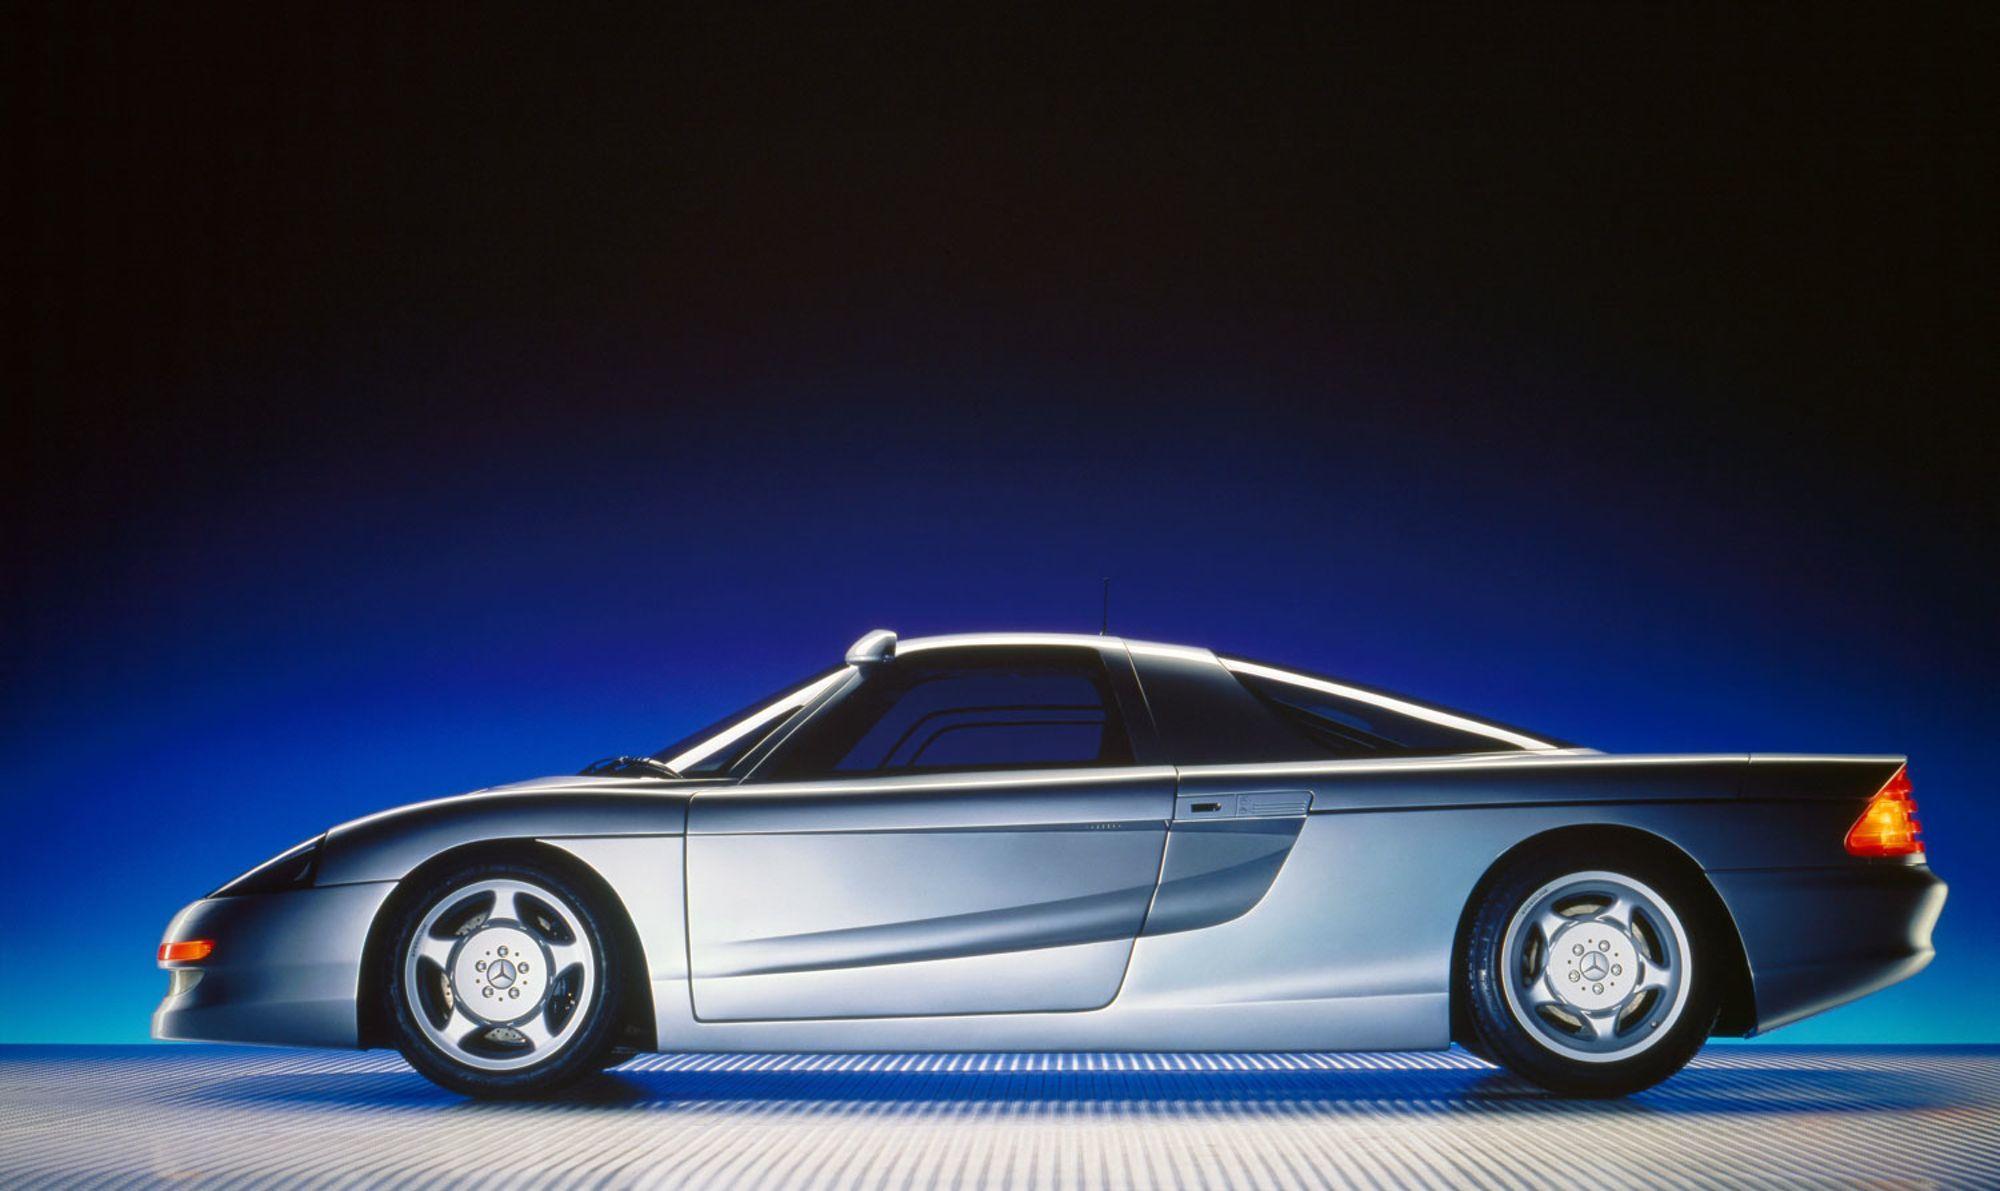 Looking Back At A Forgotten Mercedes-Benz Gullwing Supercar - Petrolicious